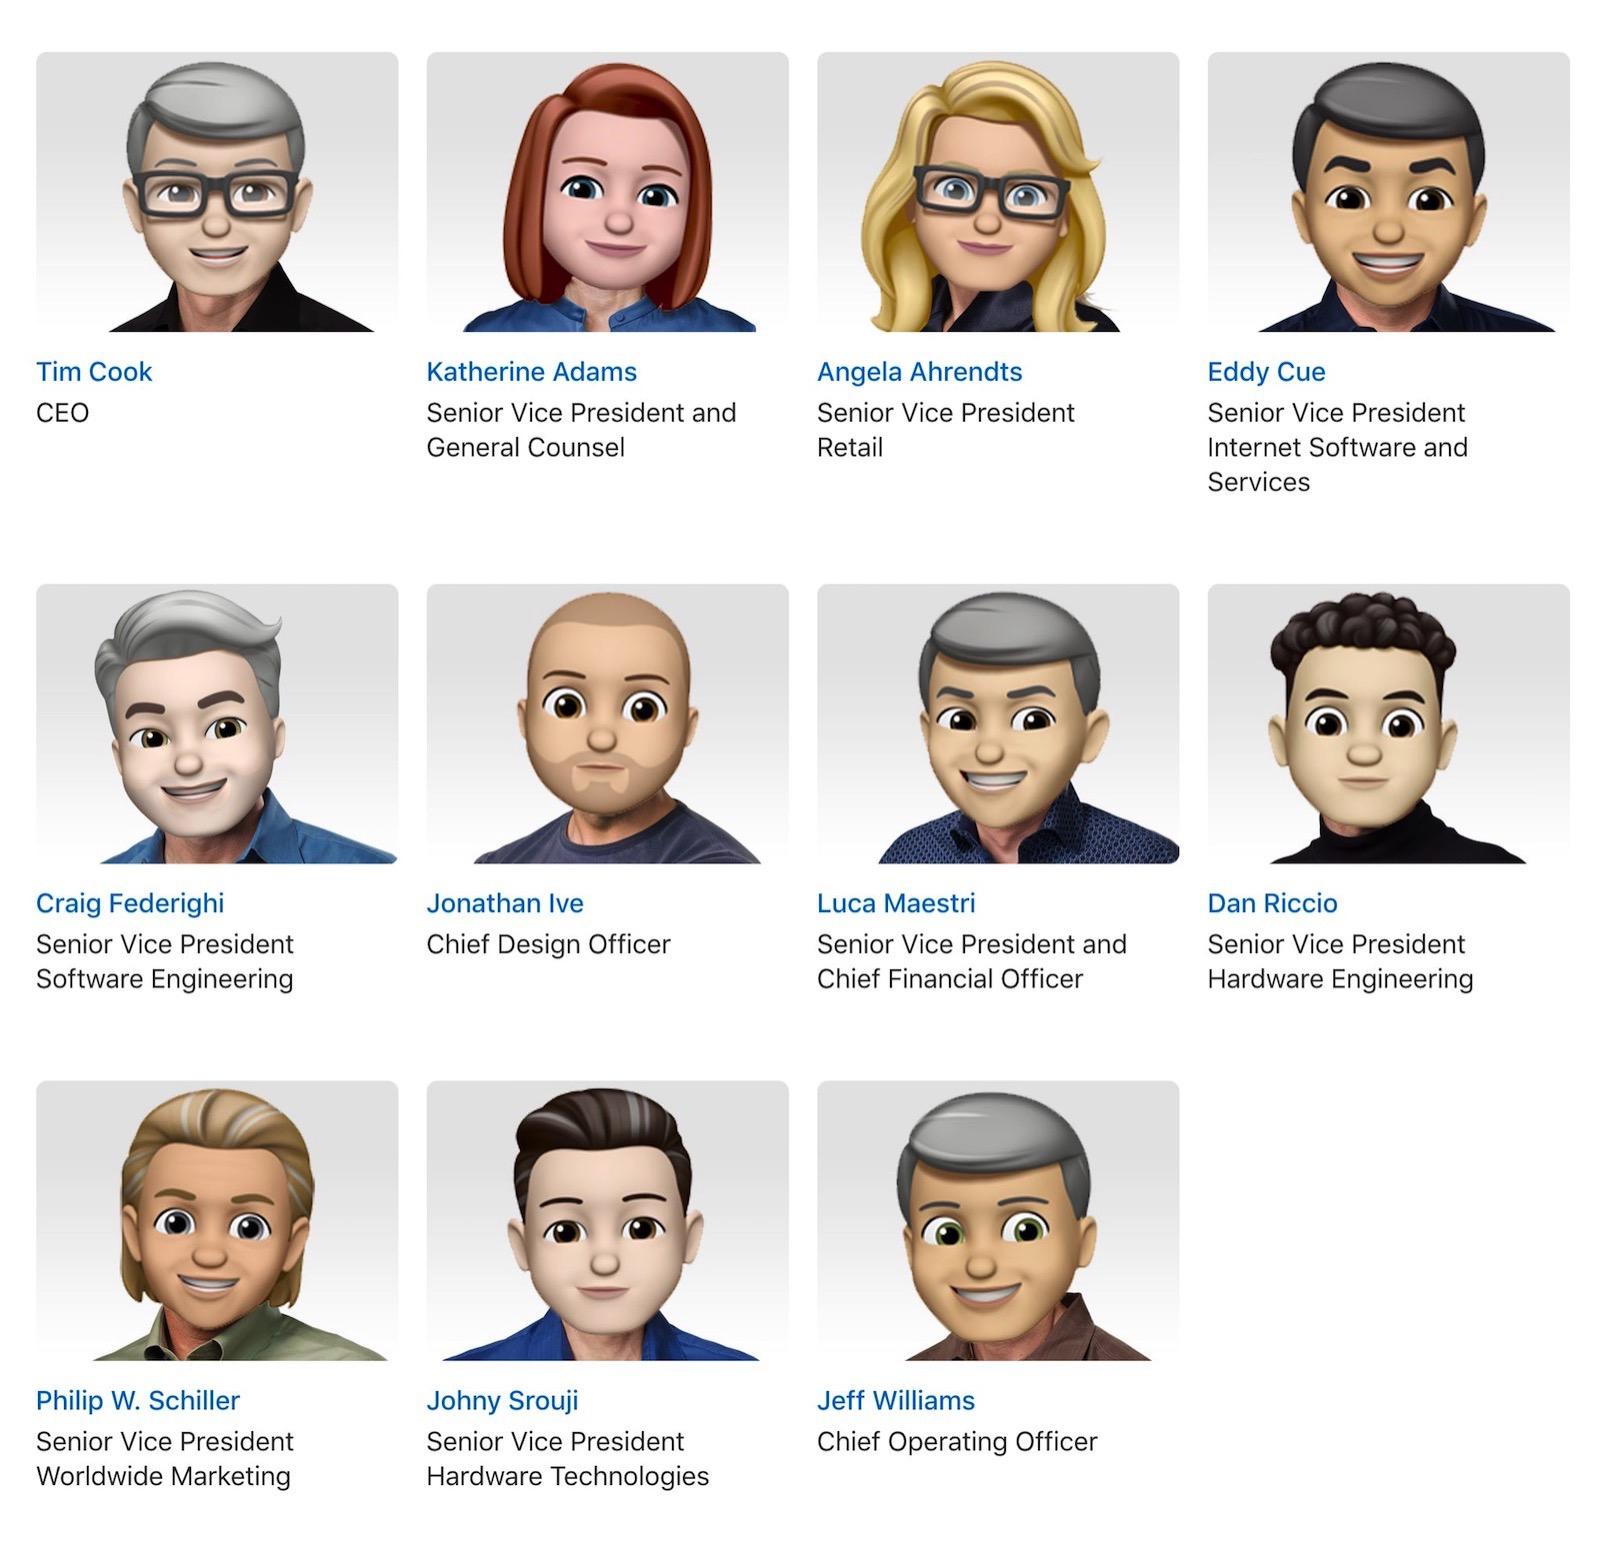 Executives Profiles in Emoji 2